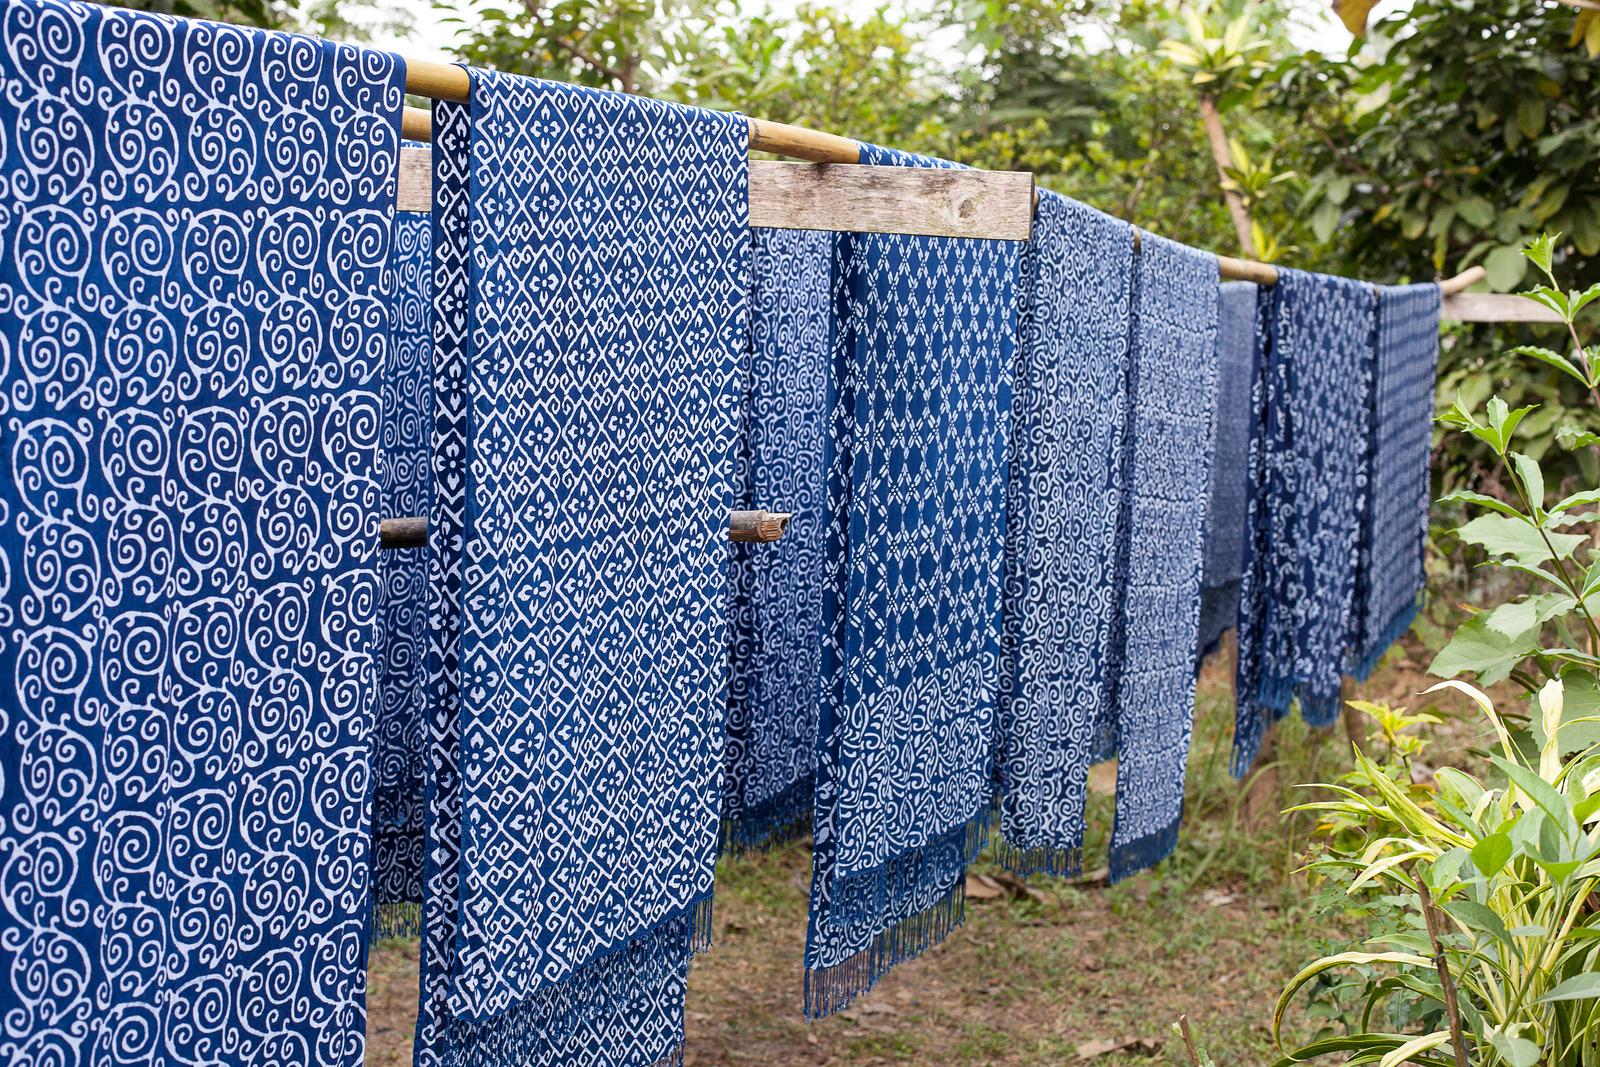 Indigo dye work